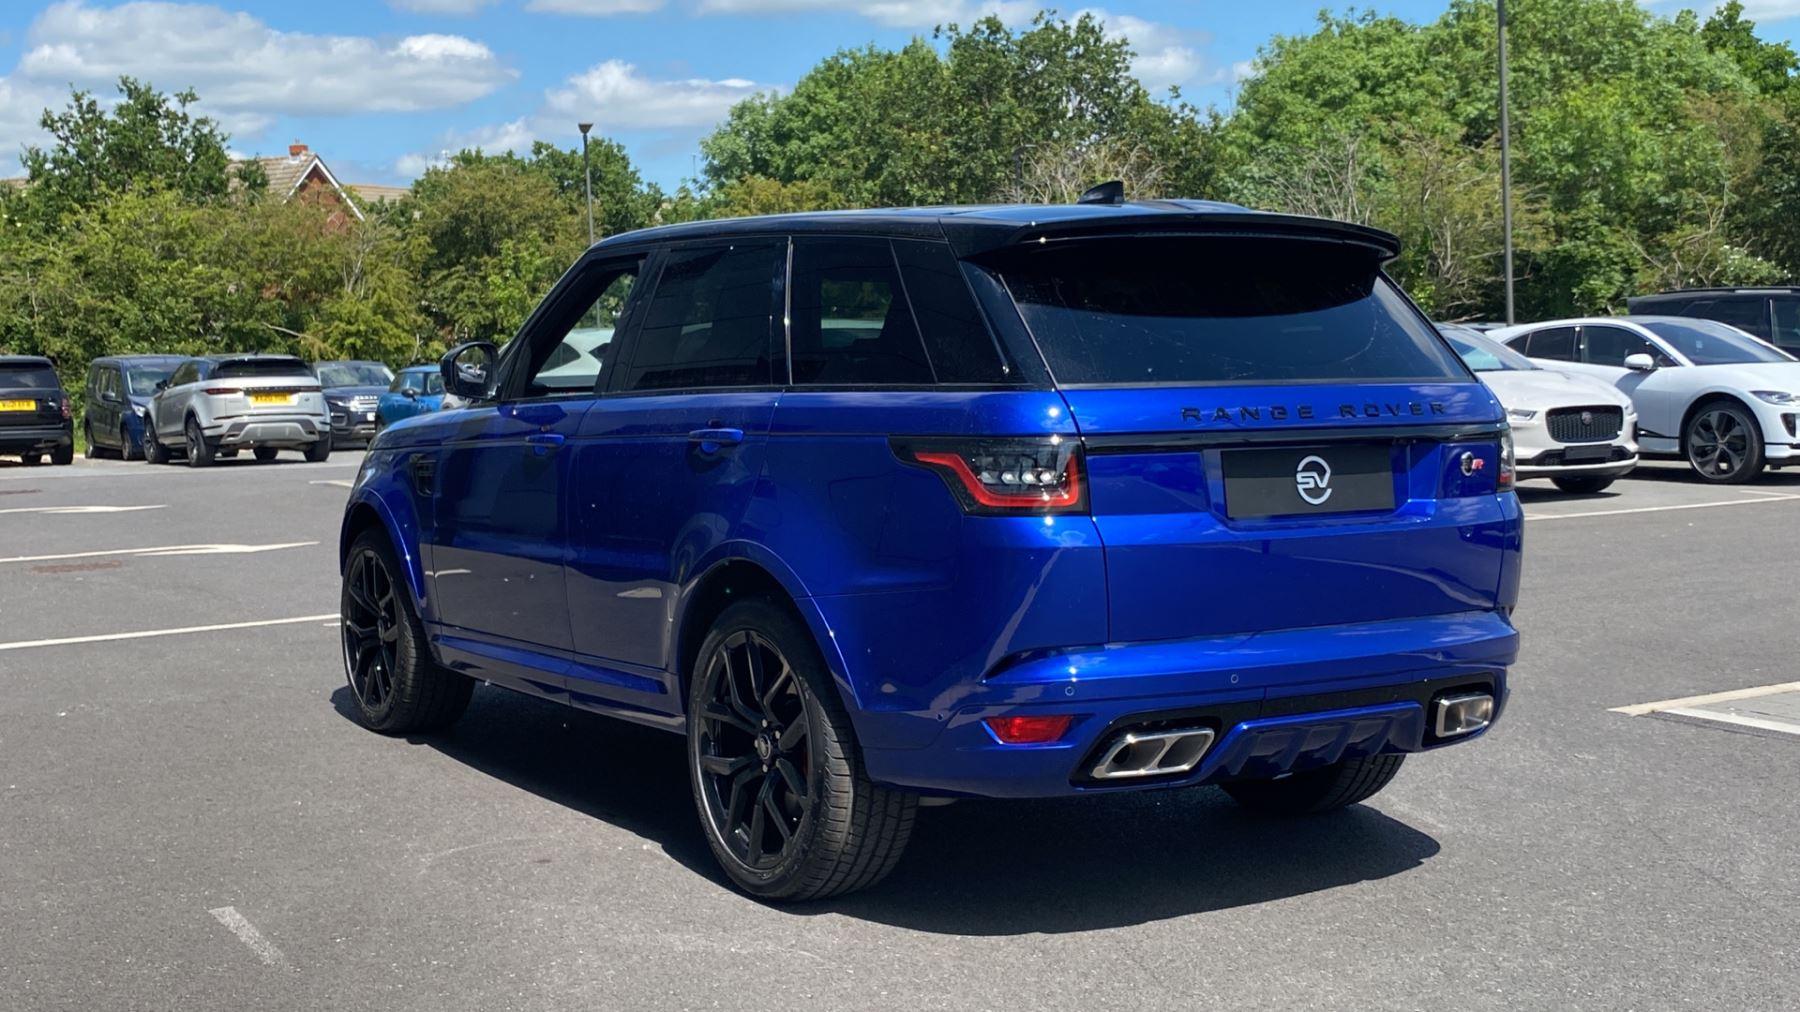 Land Rover Range Rover Sport 5.0 P575 S/C SVR image 2